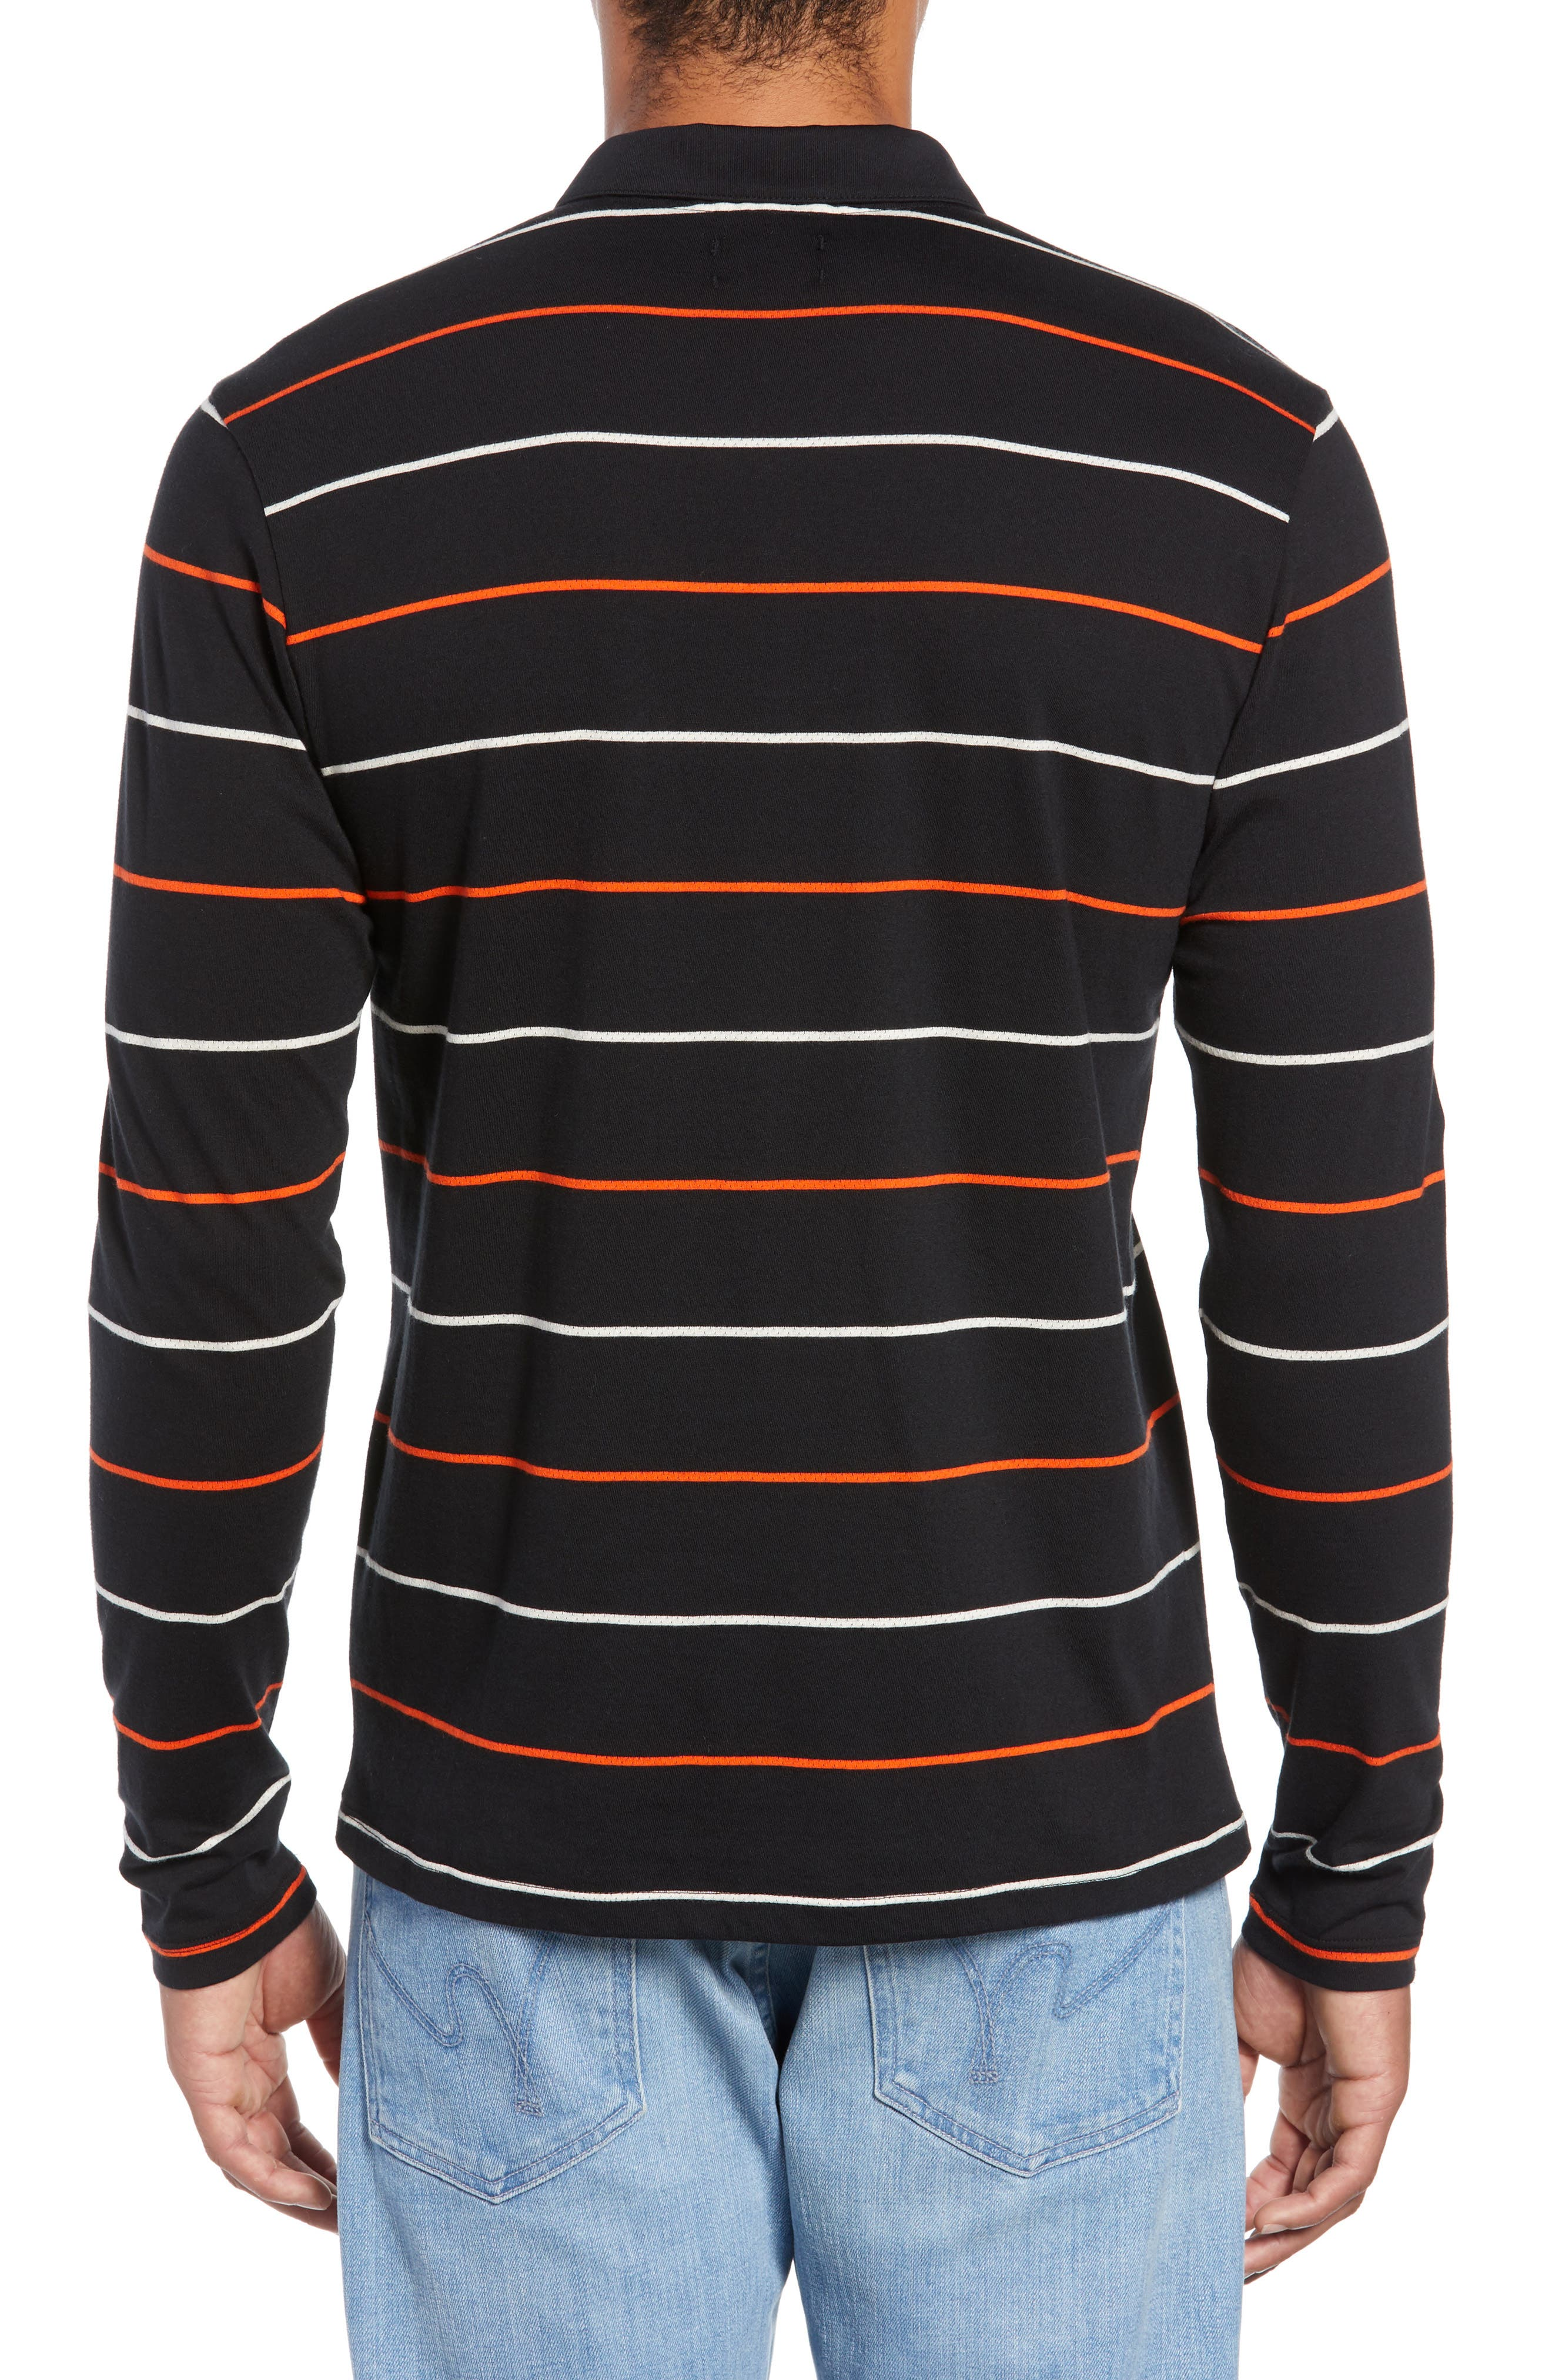 Channels Striped Long Sleeve Polo,                             Alternate thumbnail 2, color,                             BLACK